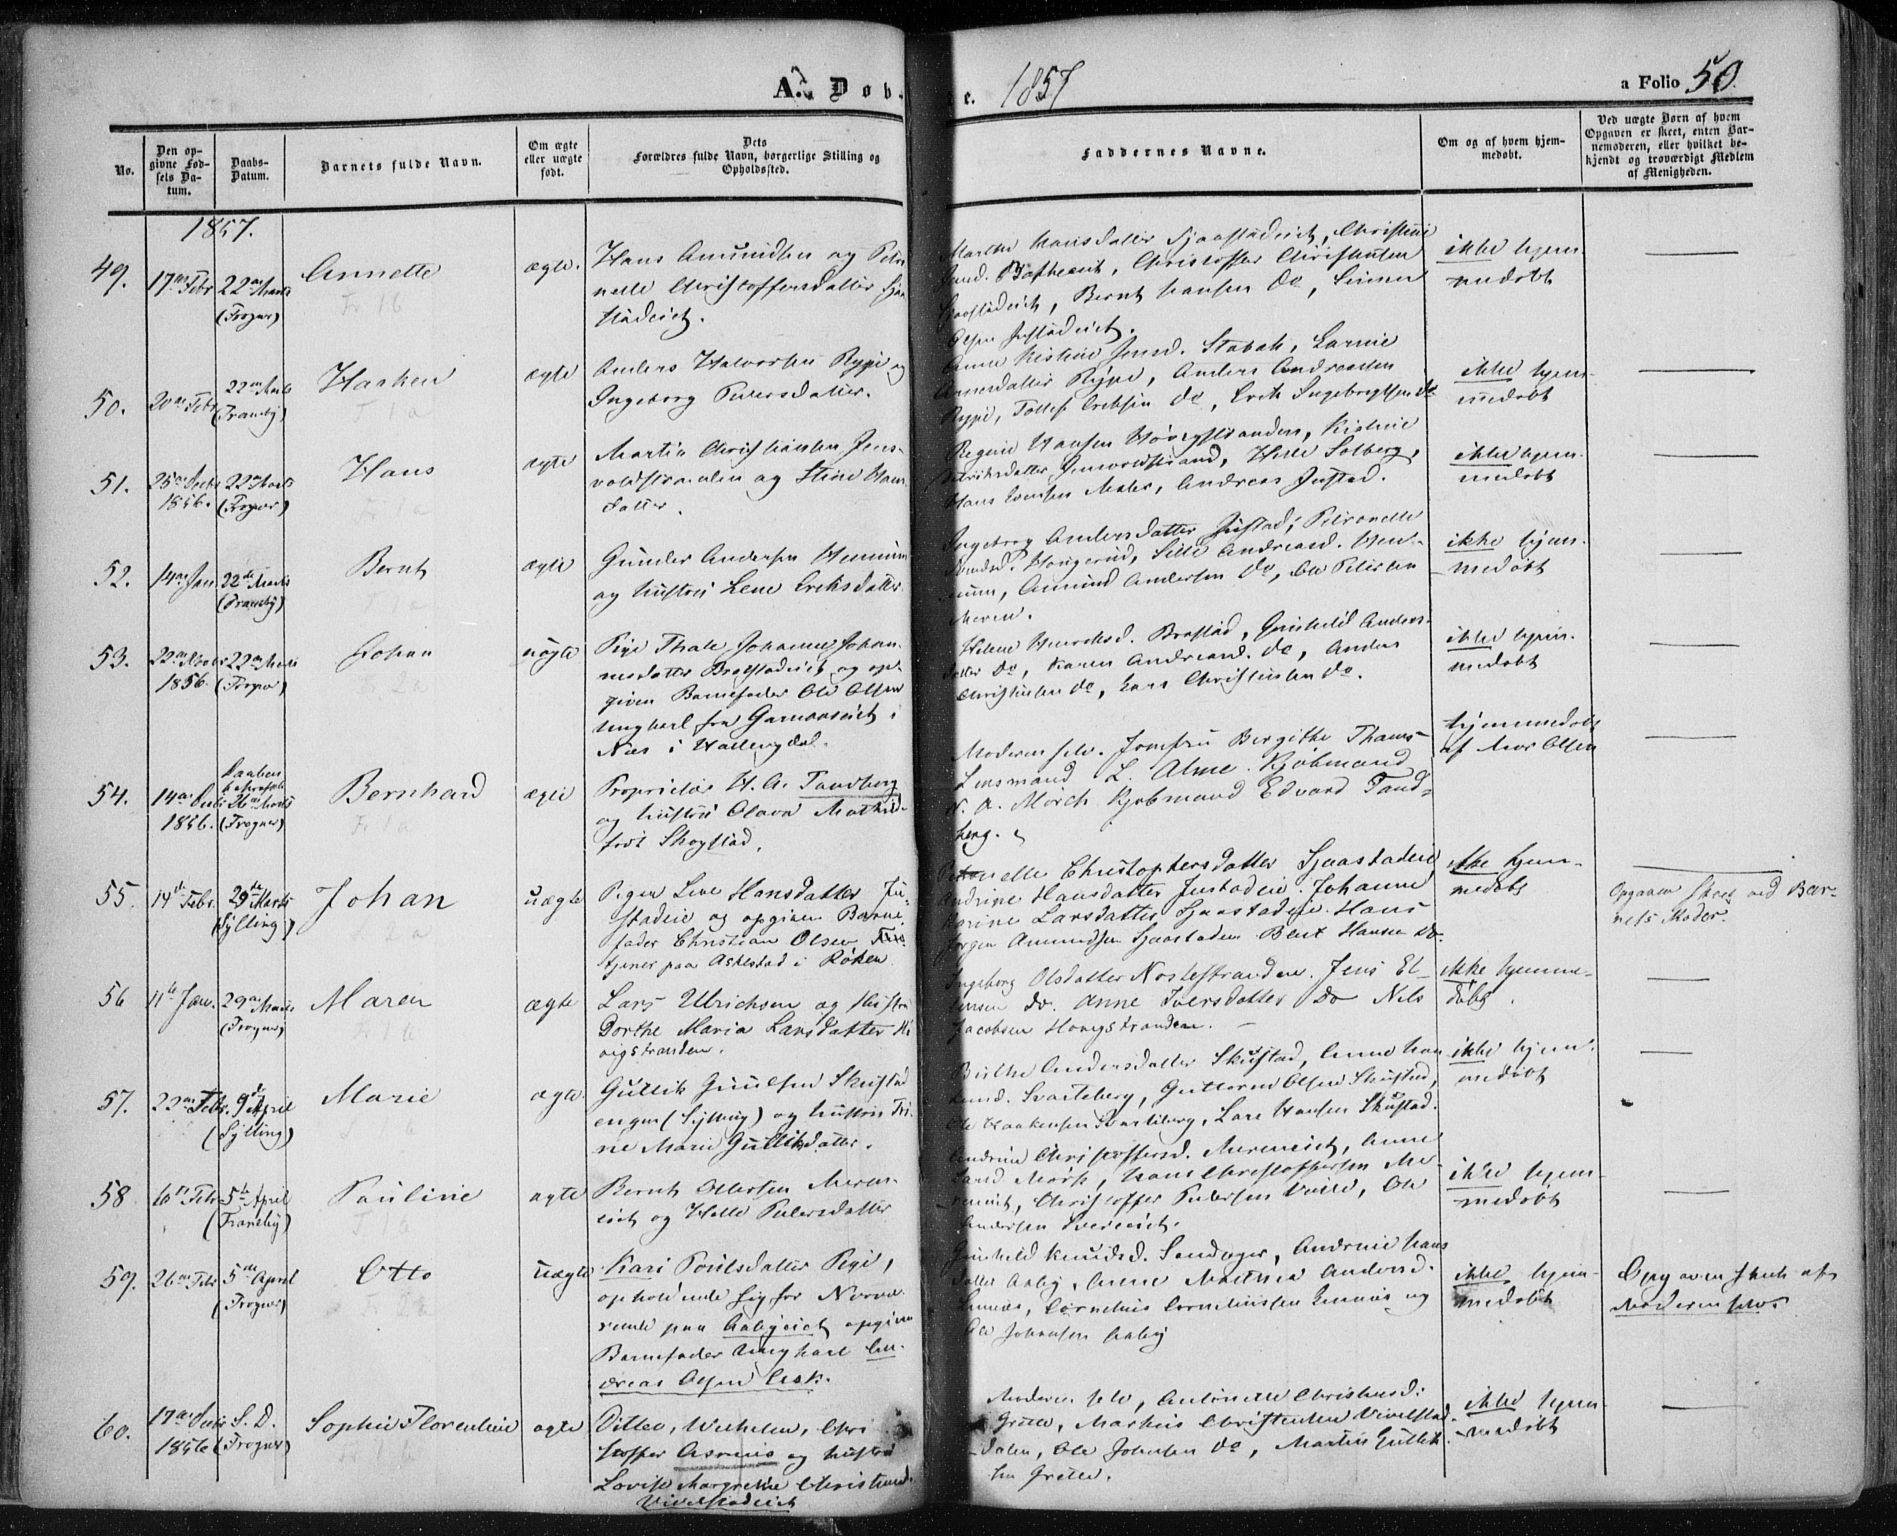 SAKO, Lier kirkebøker, F/Fa/L0012: Ministerialbok nr. I 12, 1854-1864, s. 50